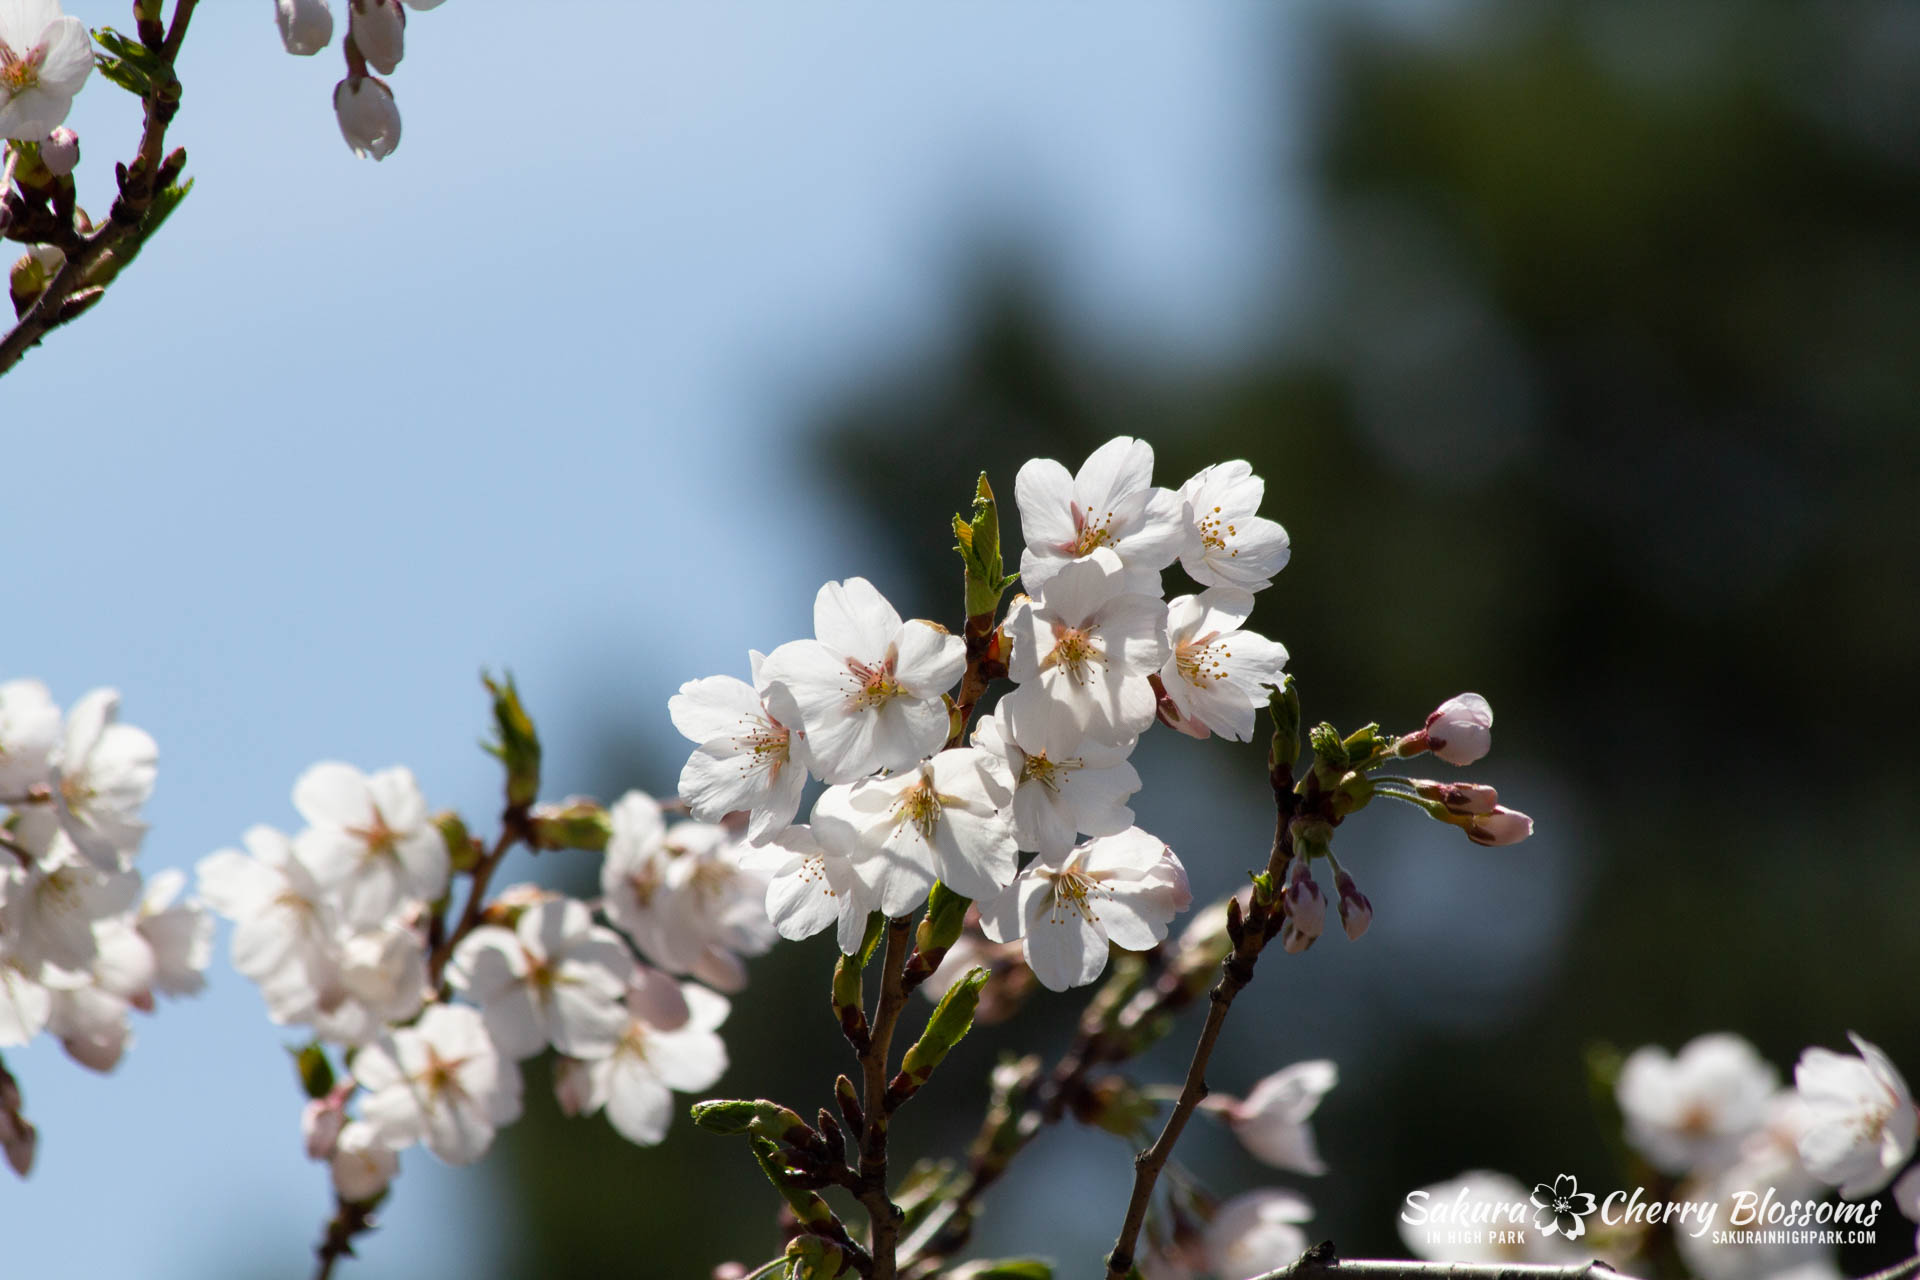 Sakura-Watch-May-5-2018-113.jpg